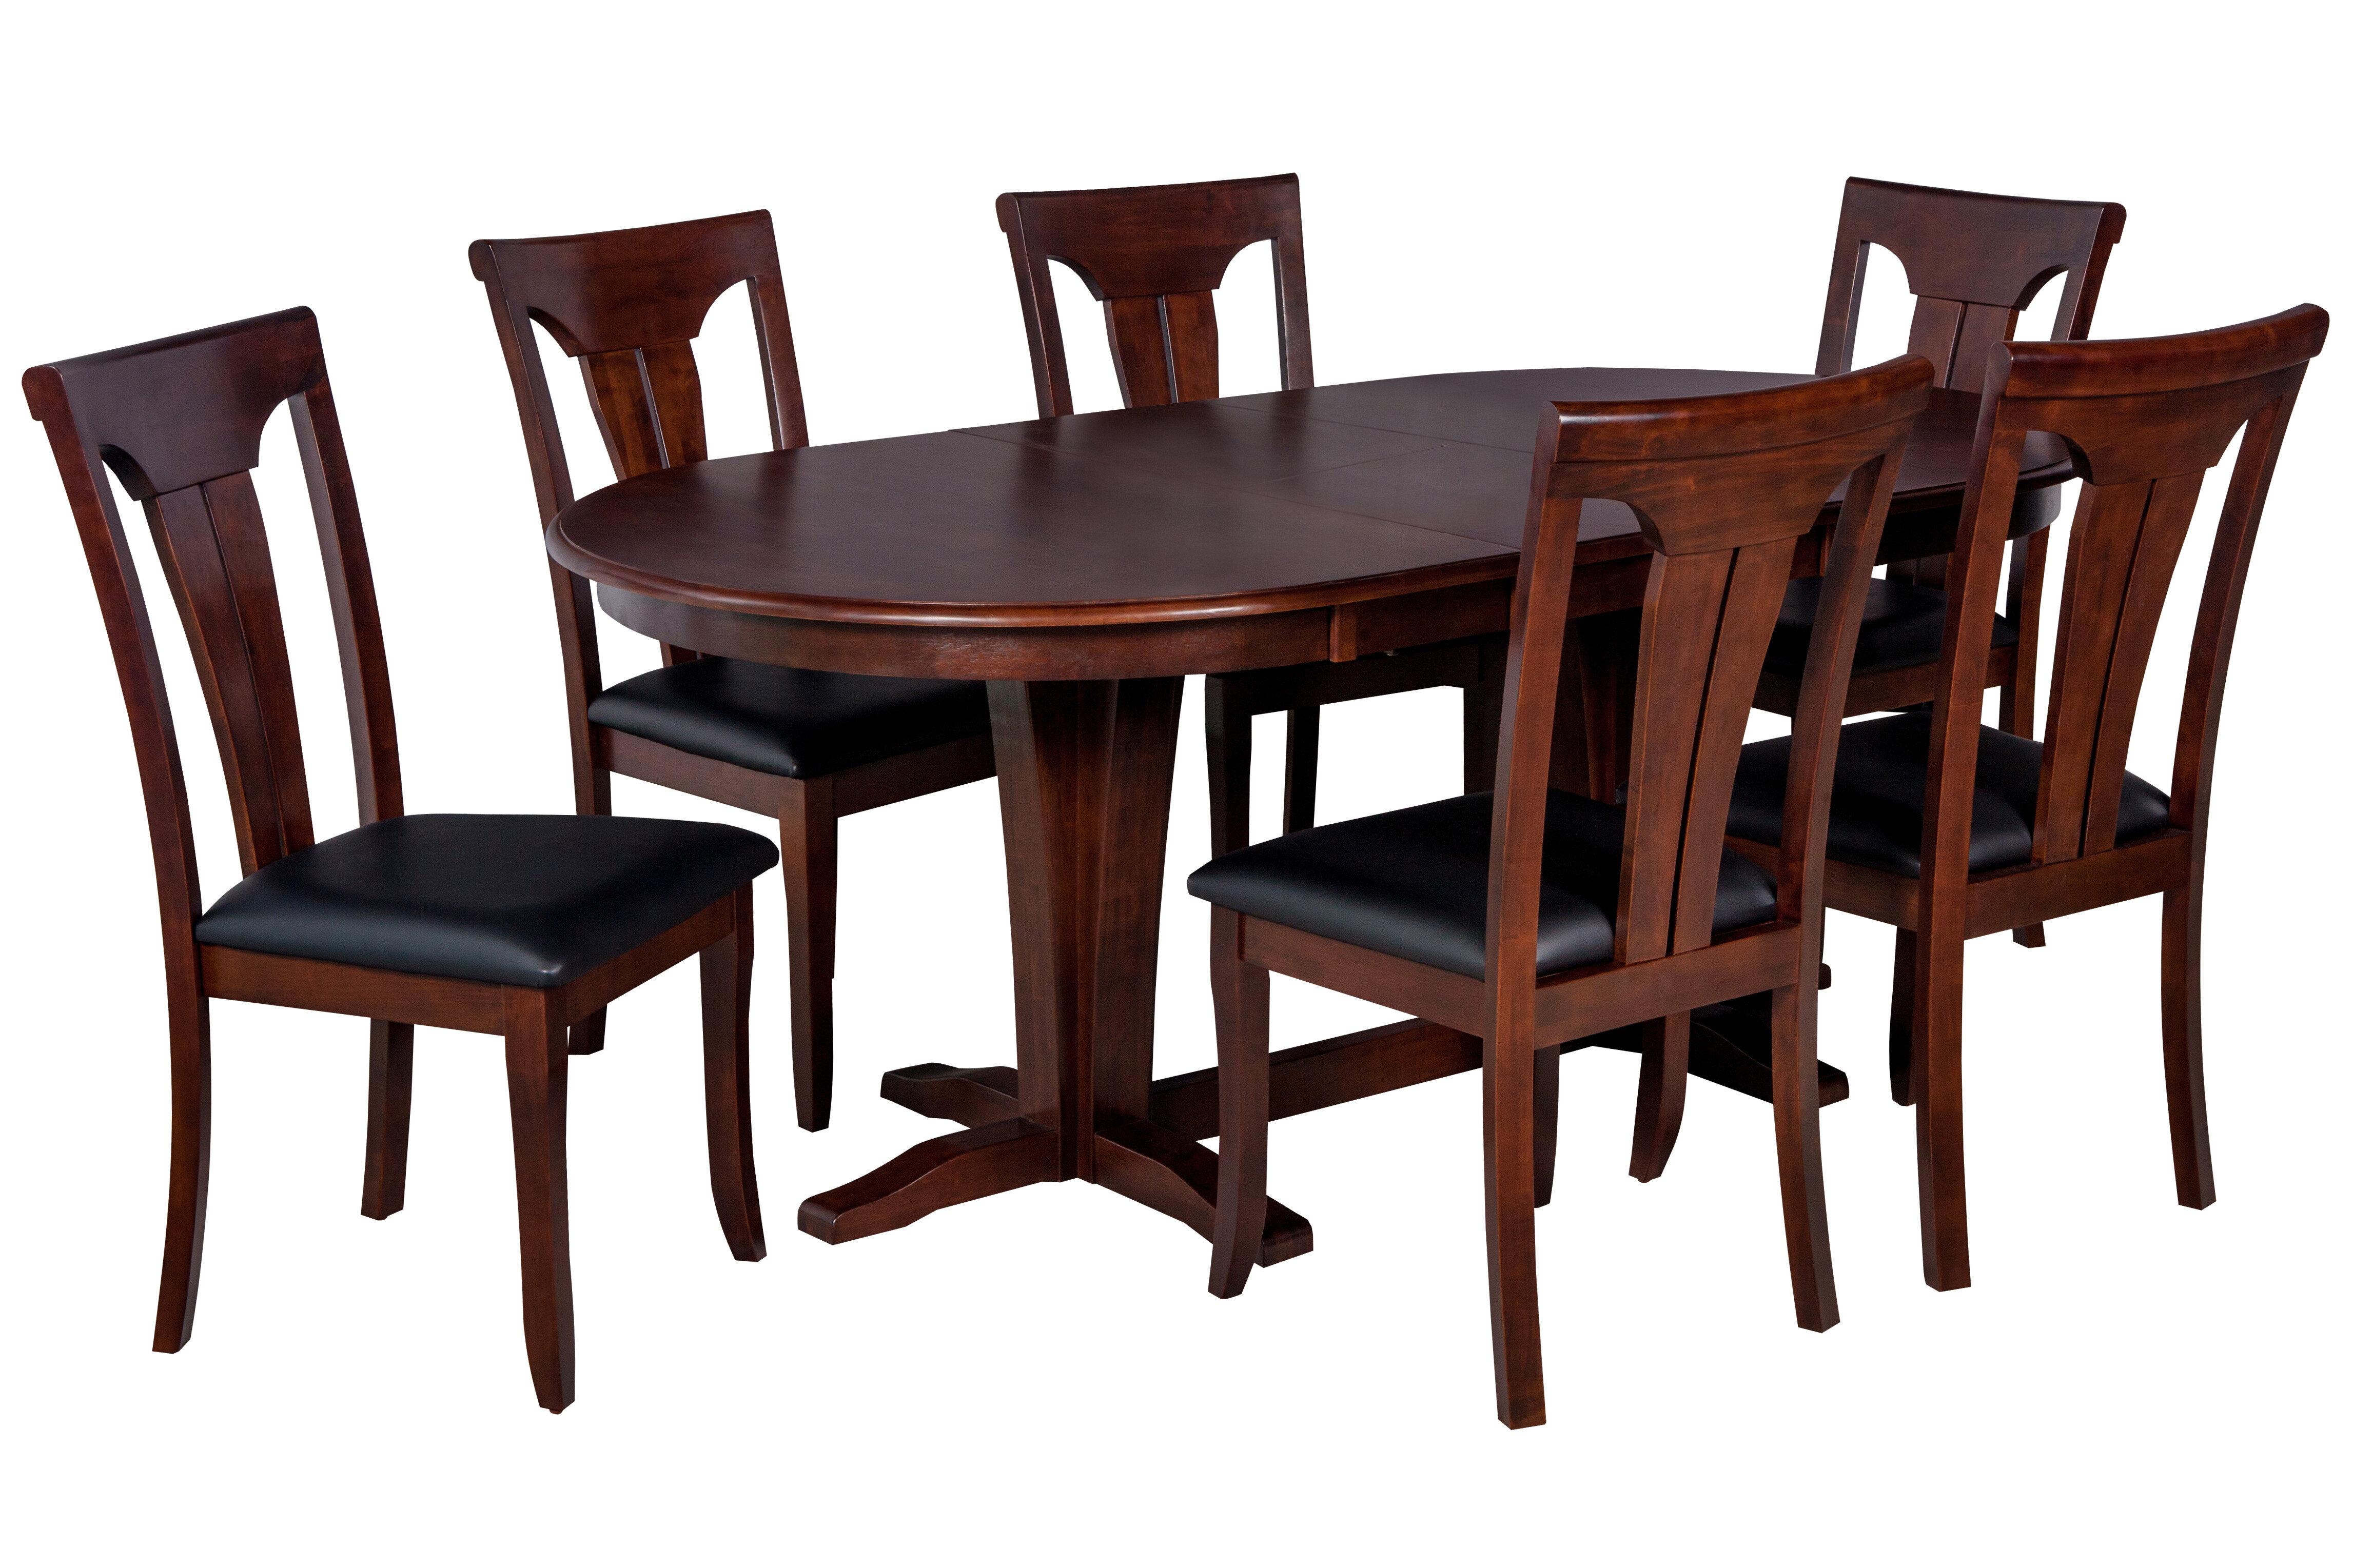 Darby Home Co Bateson 7 Piece Tropical Hardwood Dining Set | Wayfair